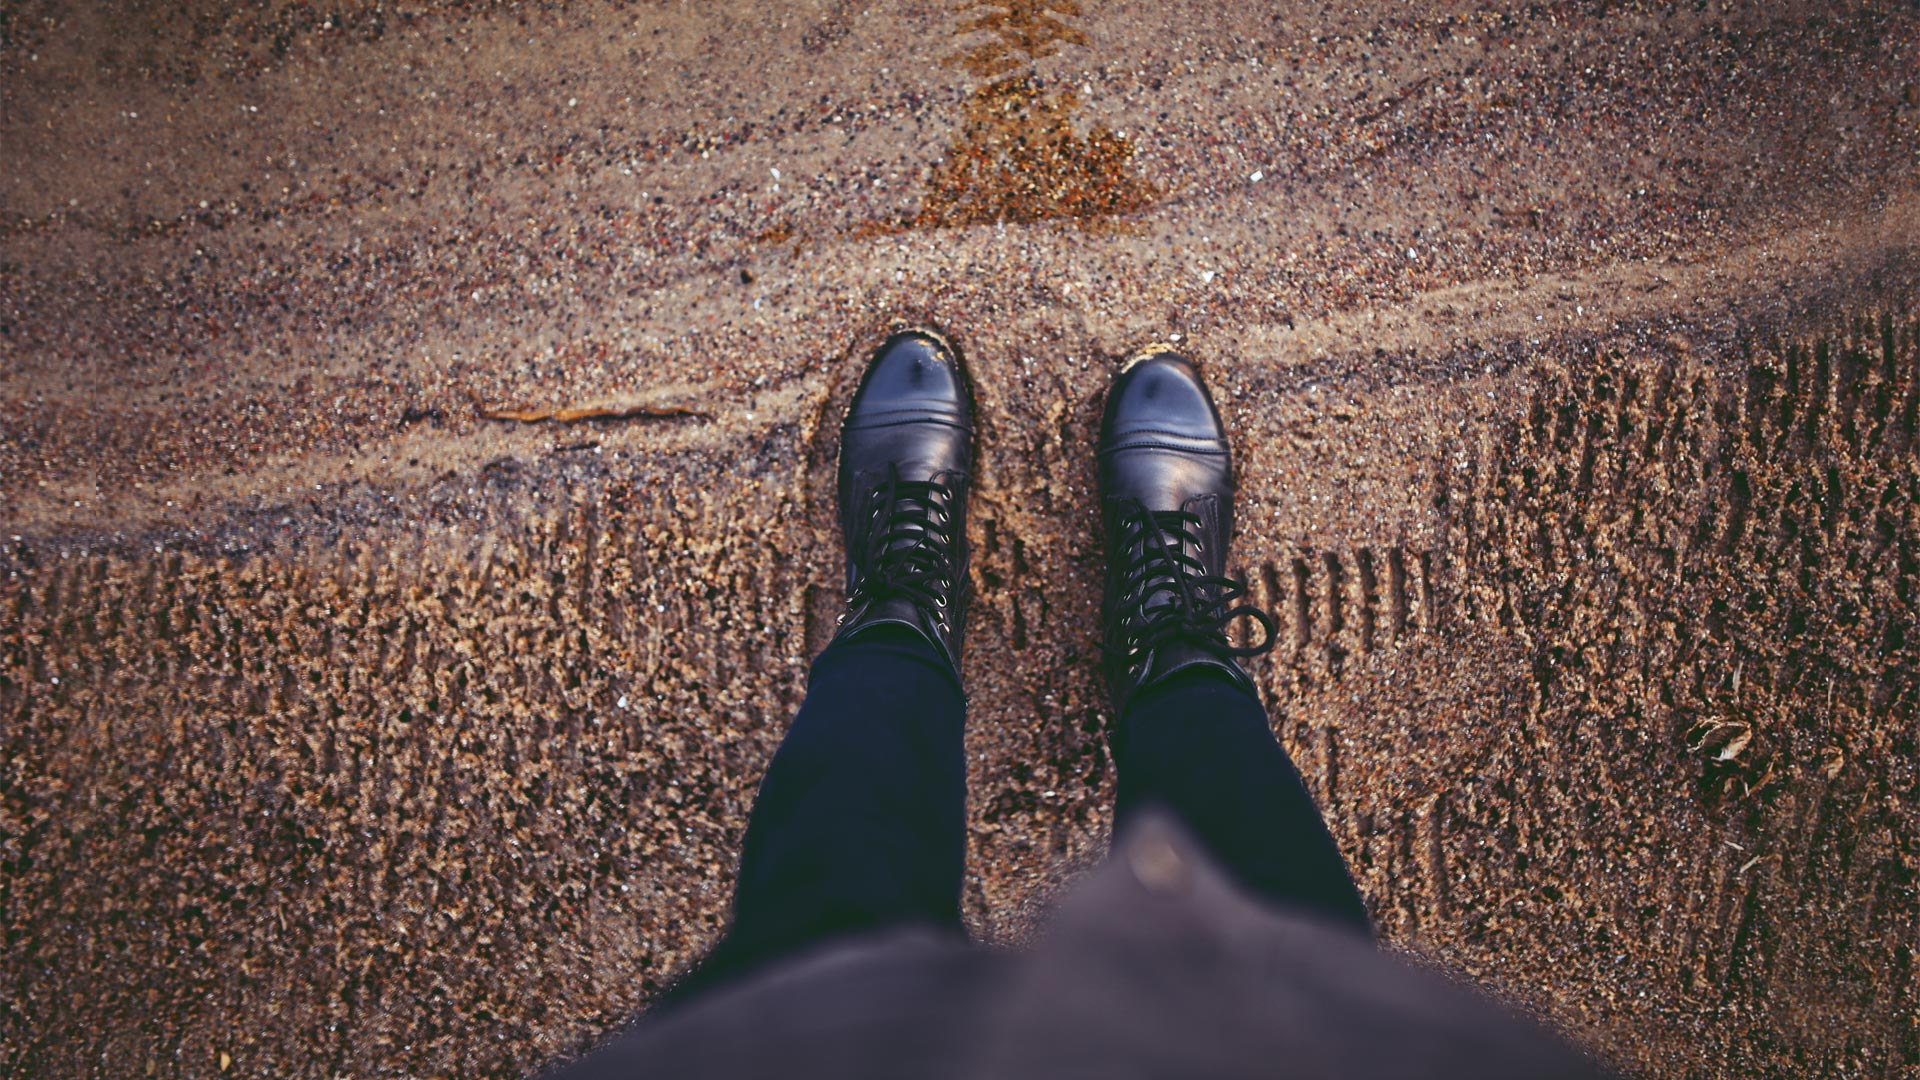 Woman's feet on the sand